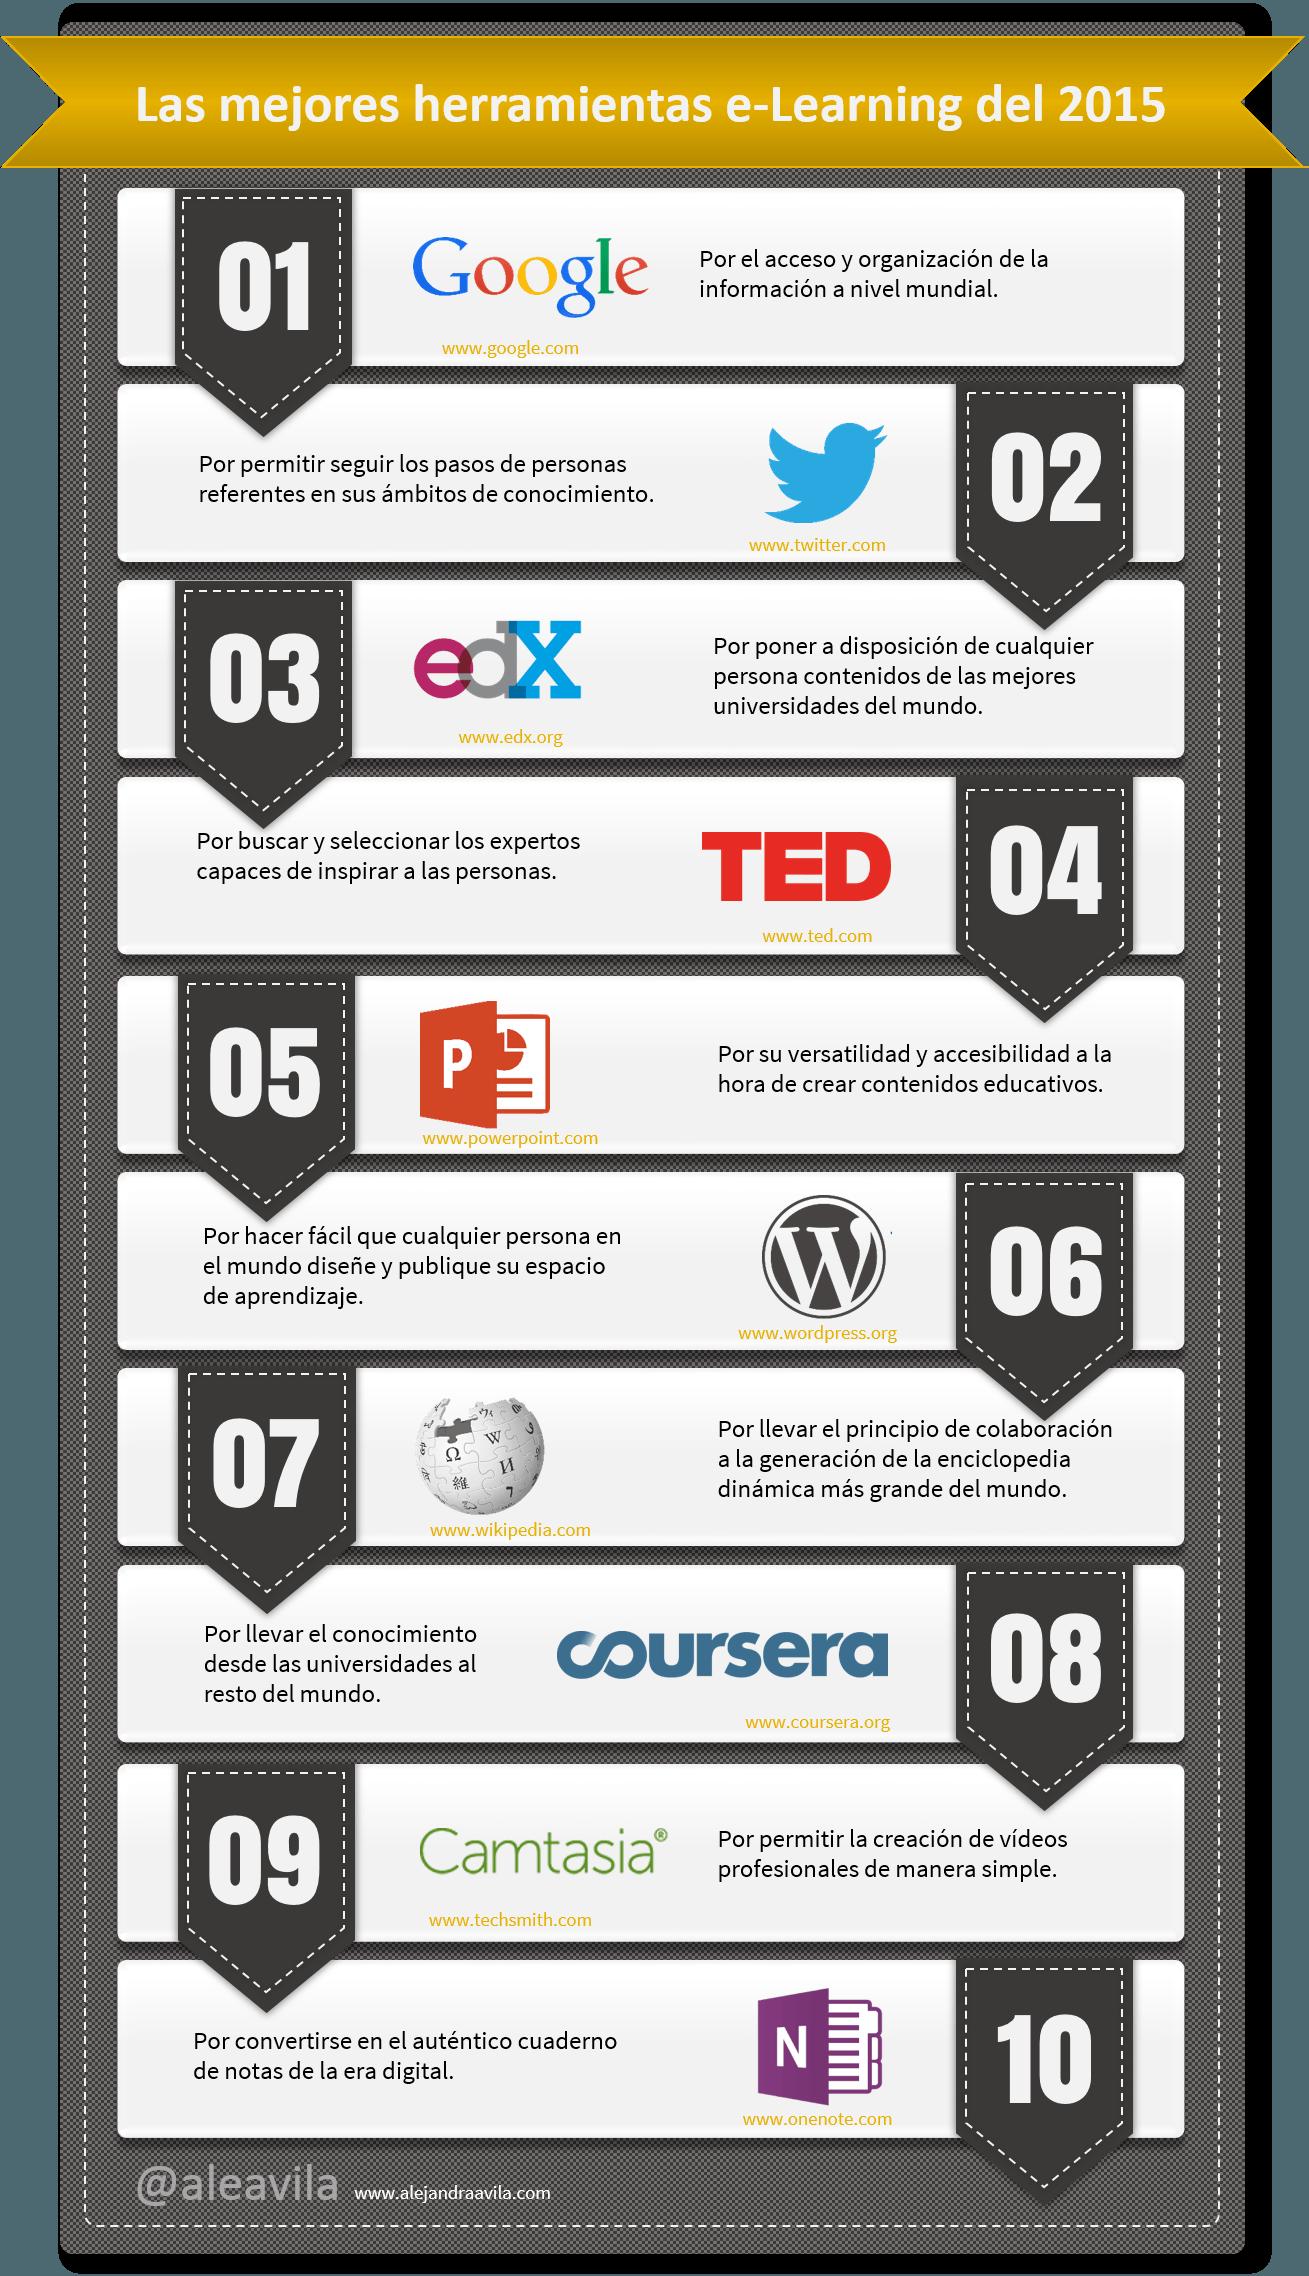 10 herramientas favoritas de e-learning